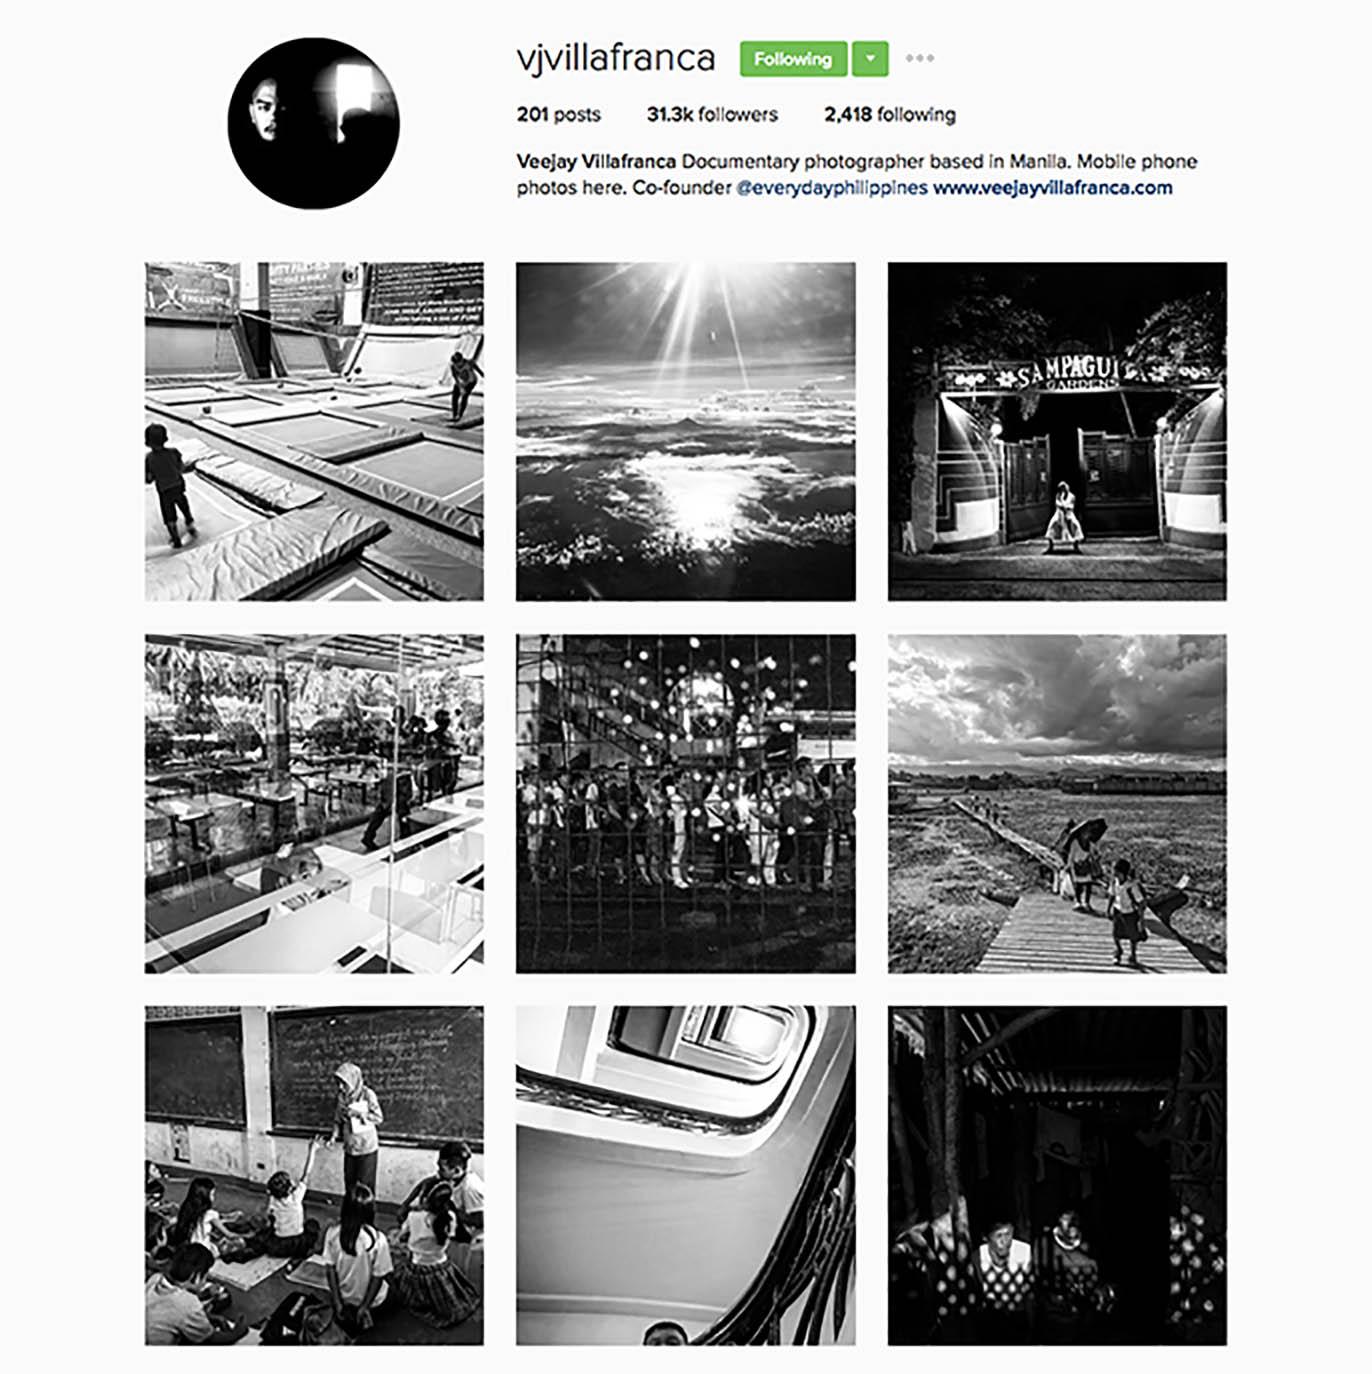 Veejay Villafranca(@vjvillafranca),菲律賓自由攝影師,Getty Reportage成員。作品關注菲律賓文化、社會議題與環境變遷,常與國際非政府組織合作,作品常發表於各國際媒體。